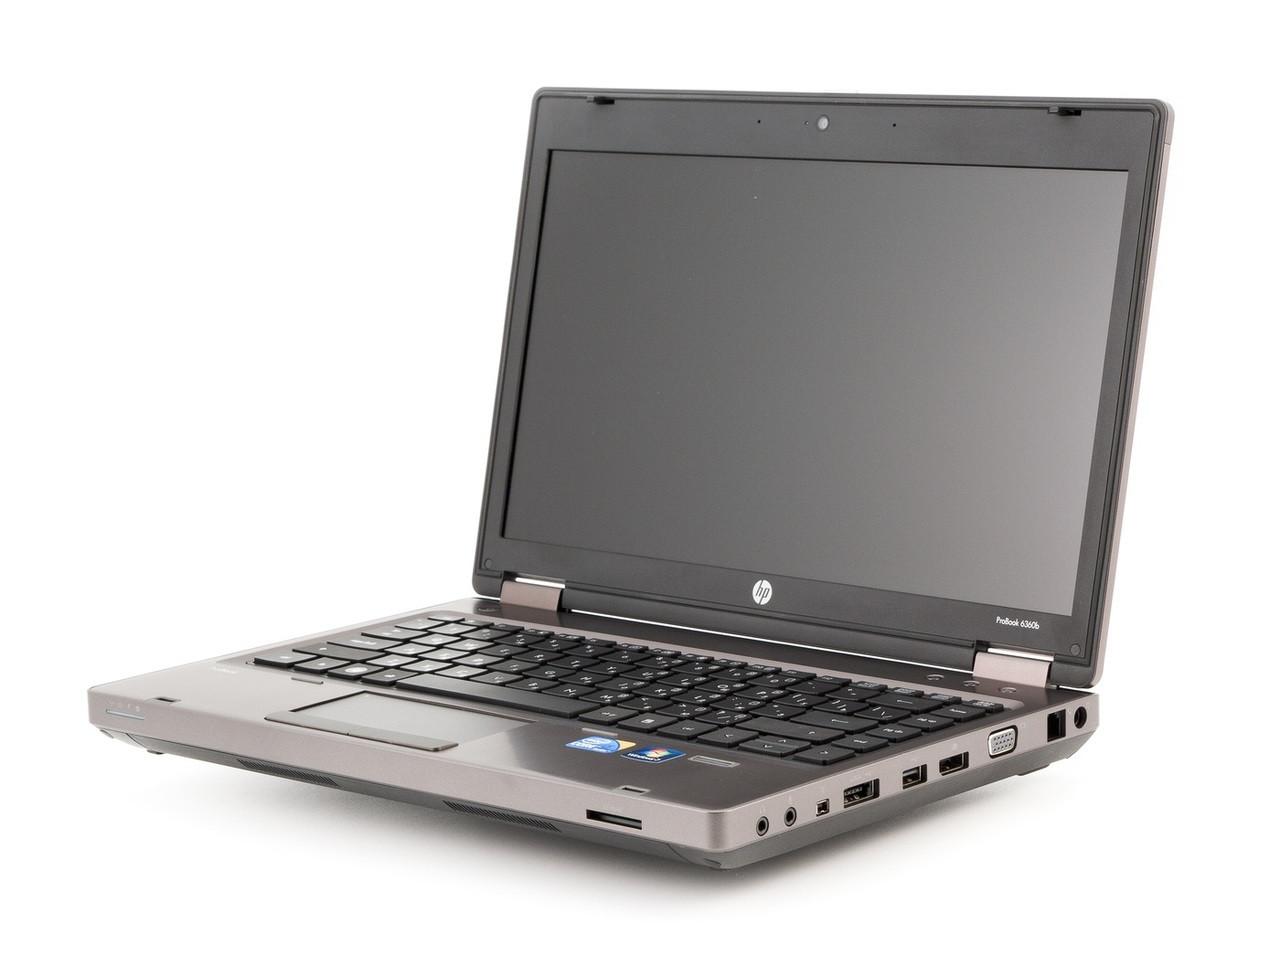 HP ProBook 6360b - Side Display View